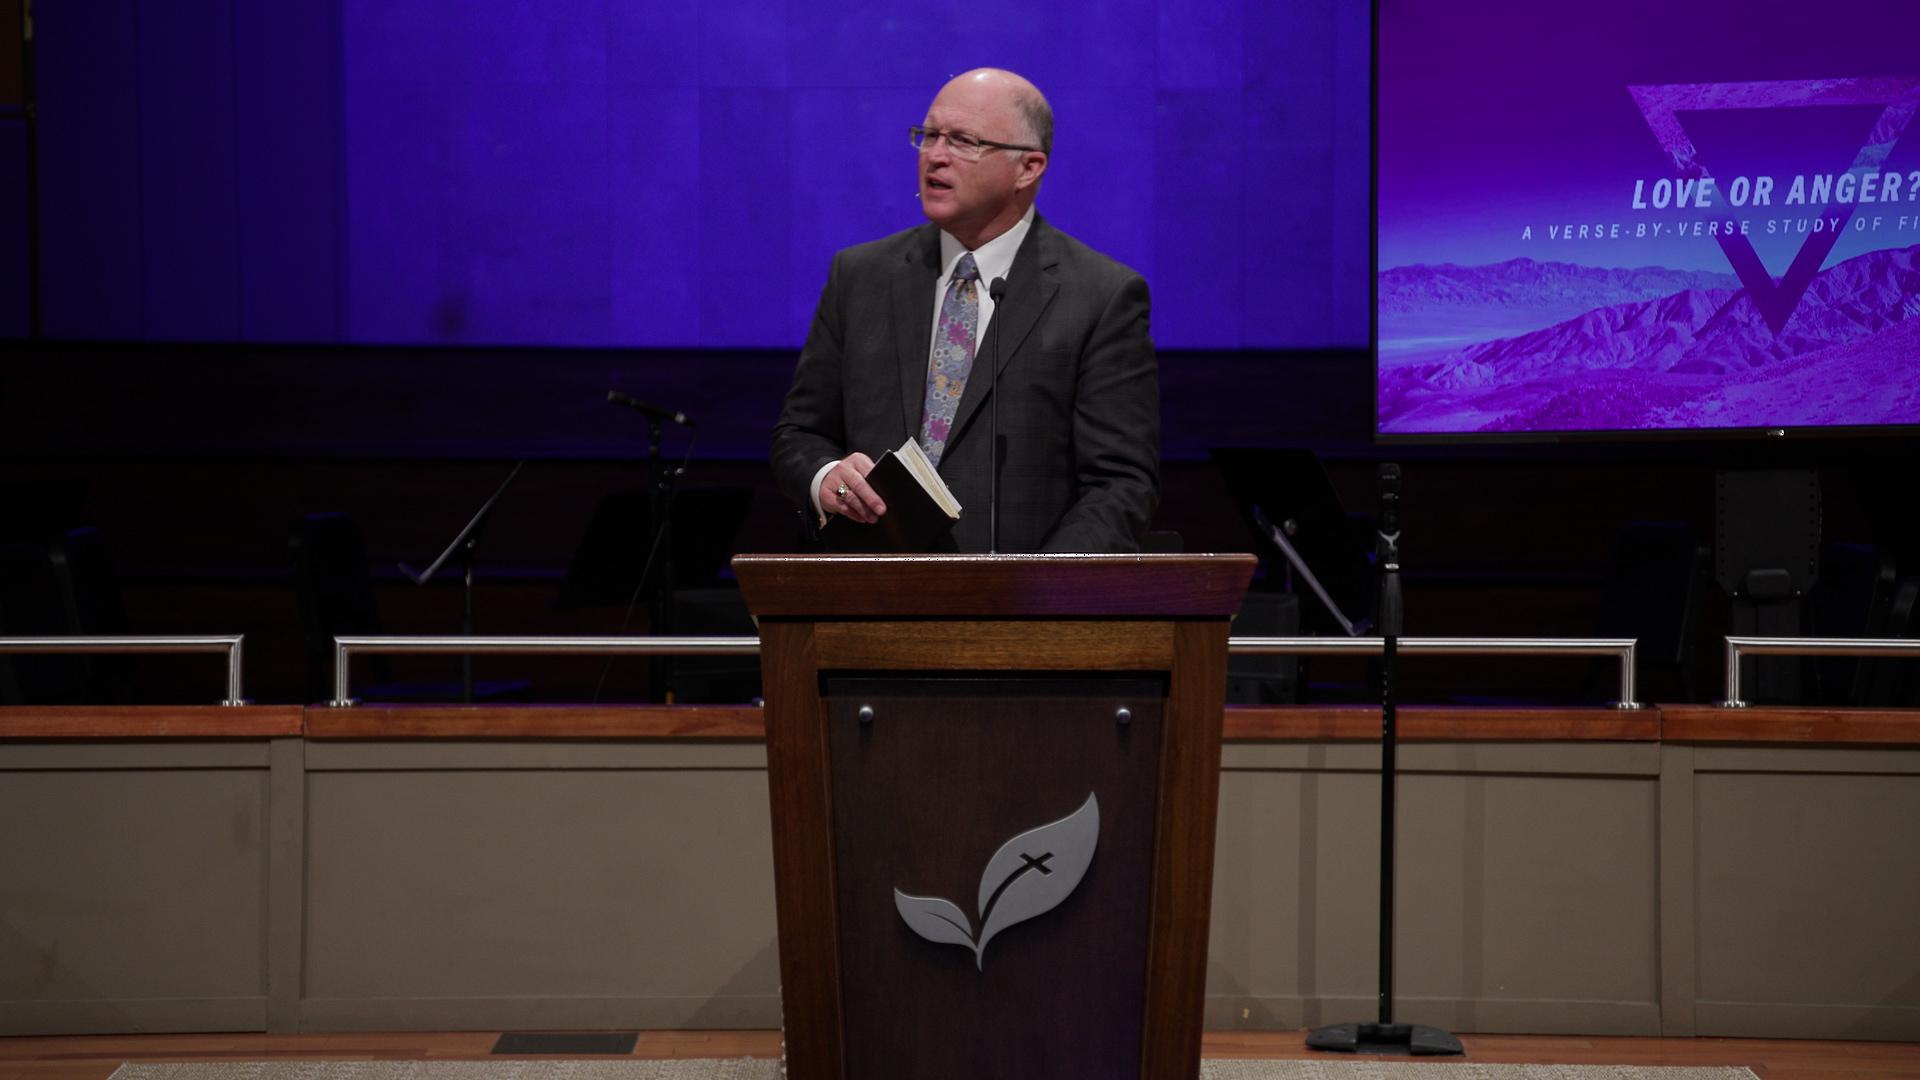 Pastor Paul Chappell: Love or Anger?